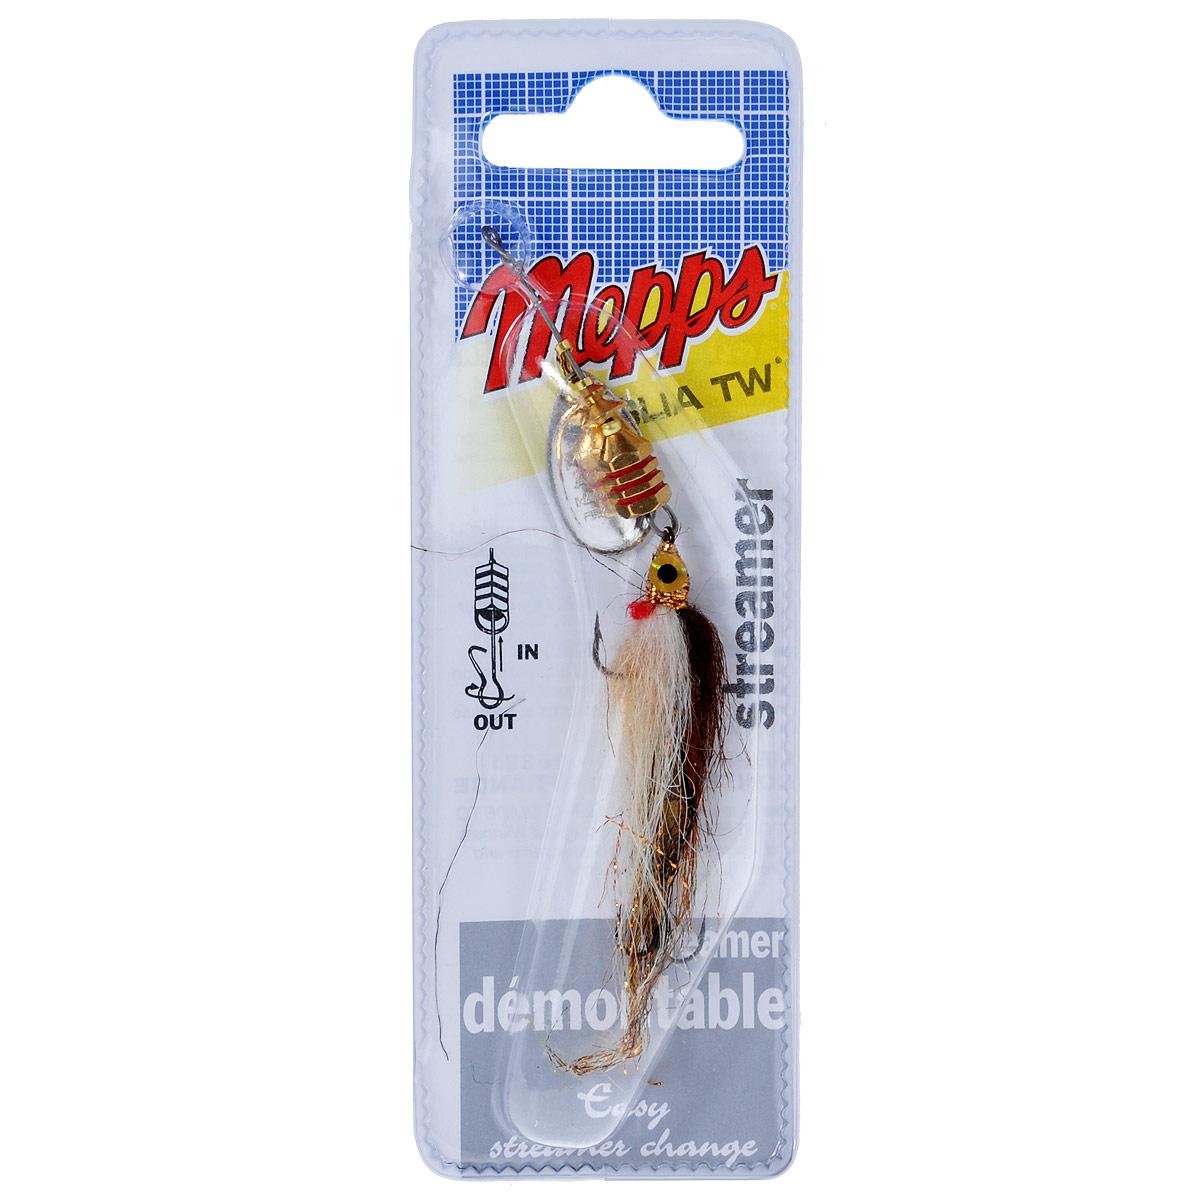 Блесна Mepps Aglia TW Streamer AG, вращающаяся, №1 блесна mepps aglia pts noirs ag 2 cpan20021